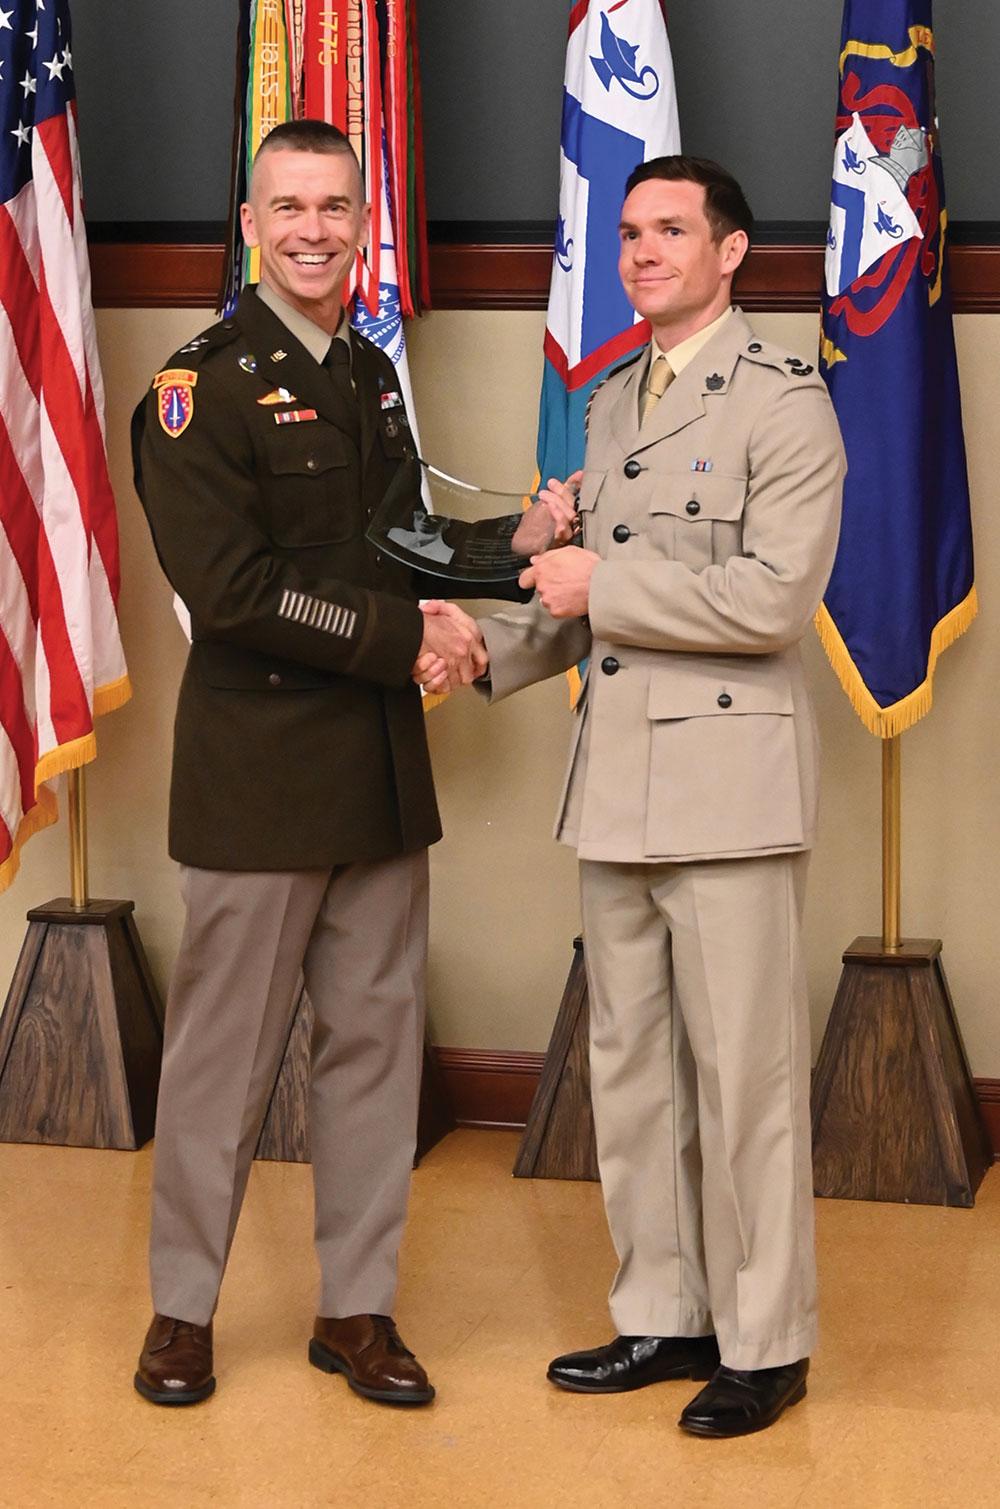 CGSC Deputy Commandant Maj. Gen. Donn Hill presents the Eisenhower Award to Maj. Philip Anderson, International Military Student, United Kingdom.